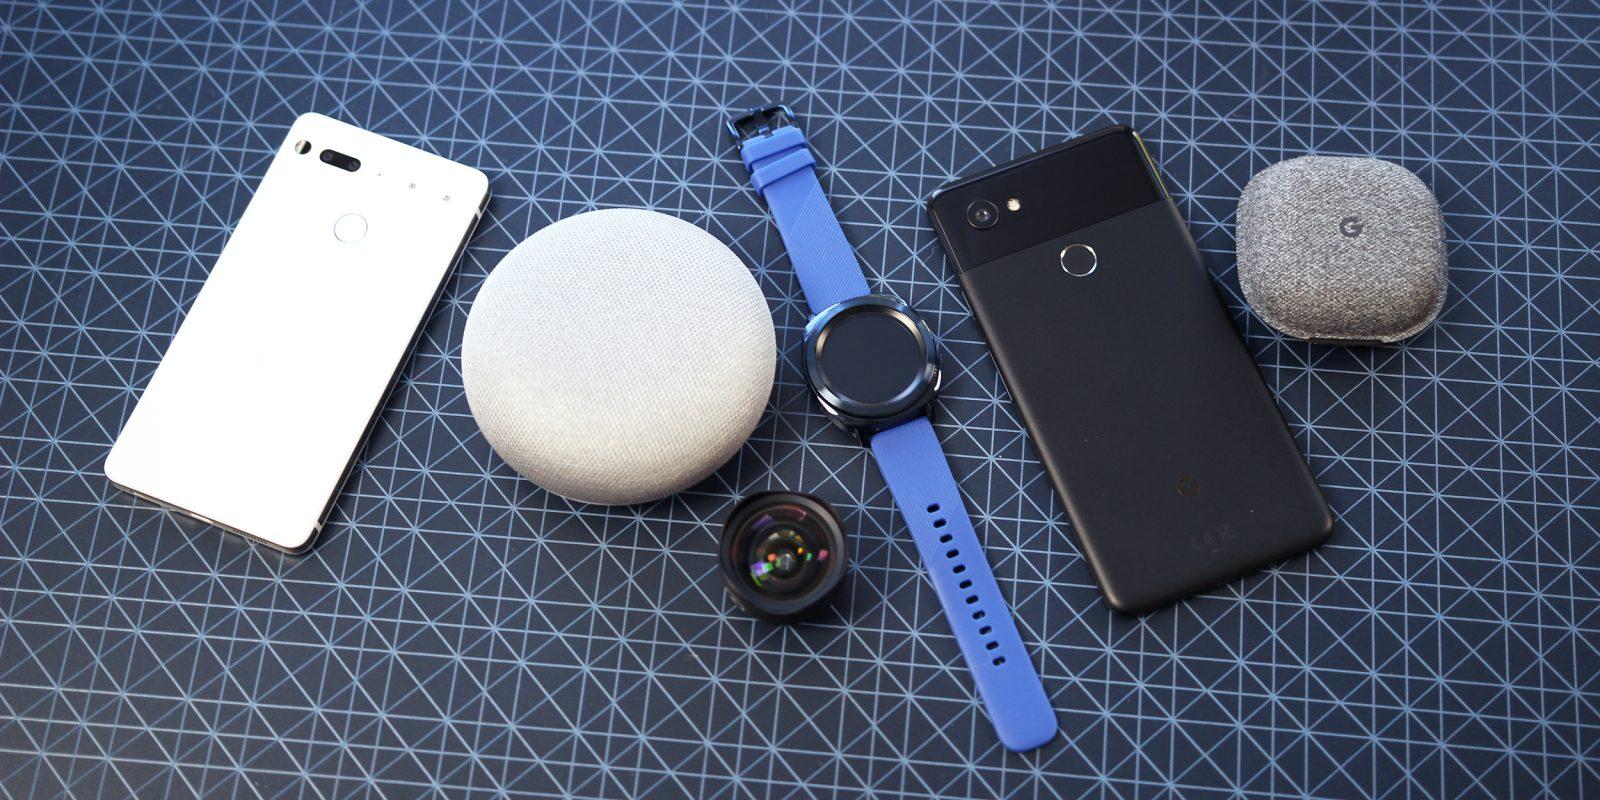 Ben's 9to5Google Gift Guide ─ The best phones, Chromebooks